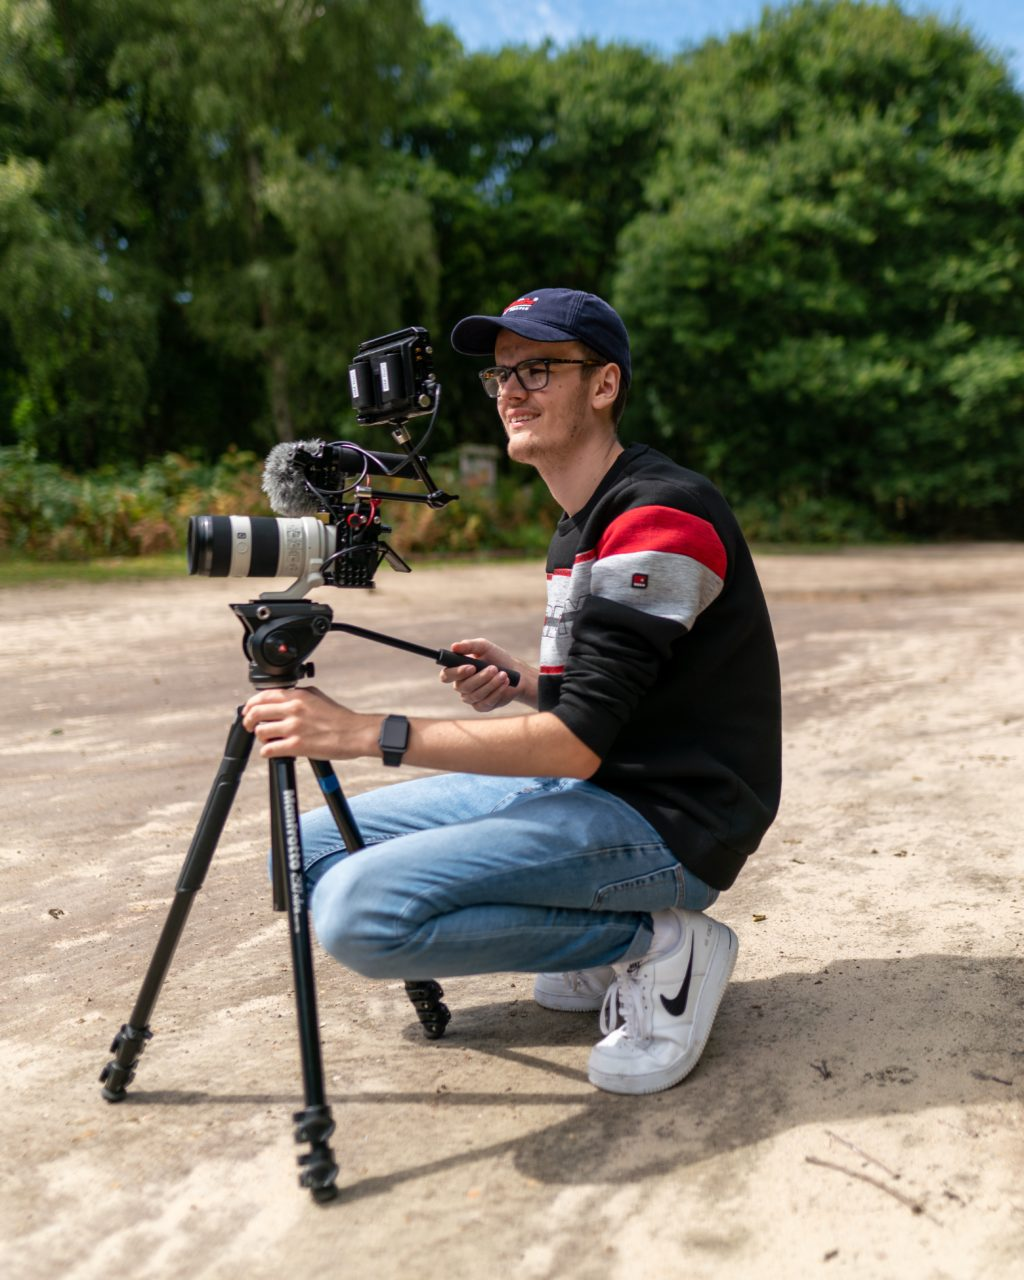 Man squats beside his camera and tripod